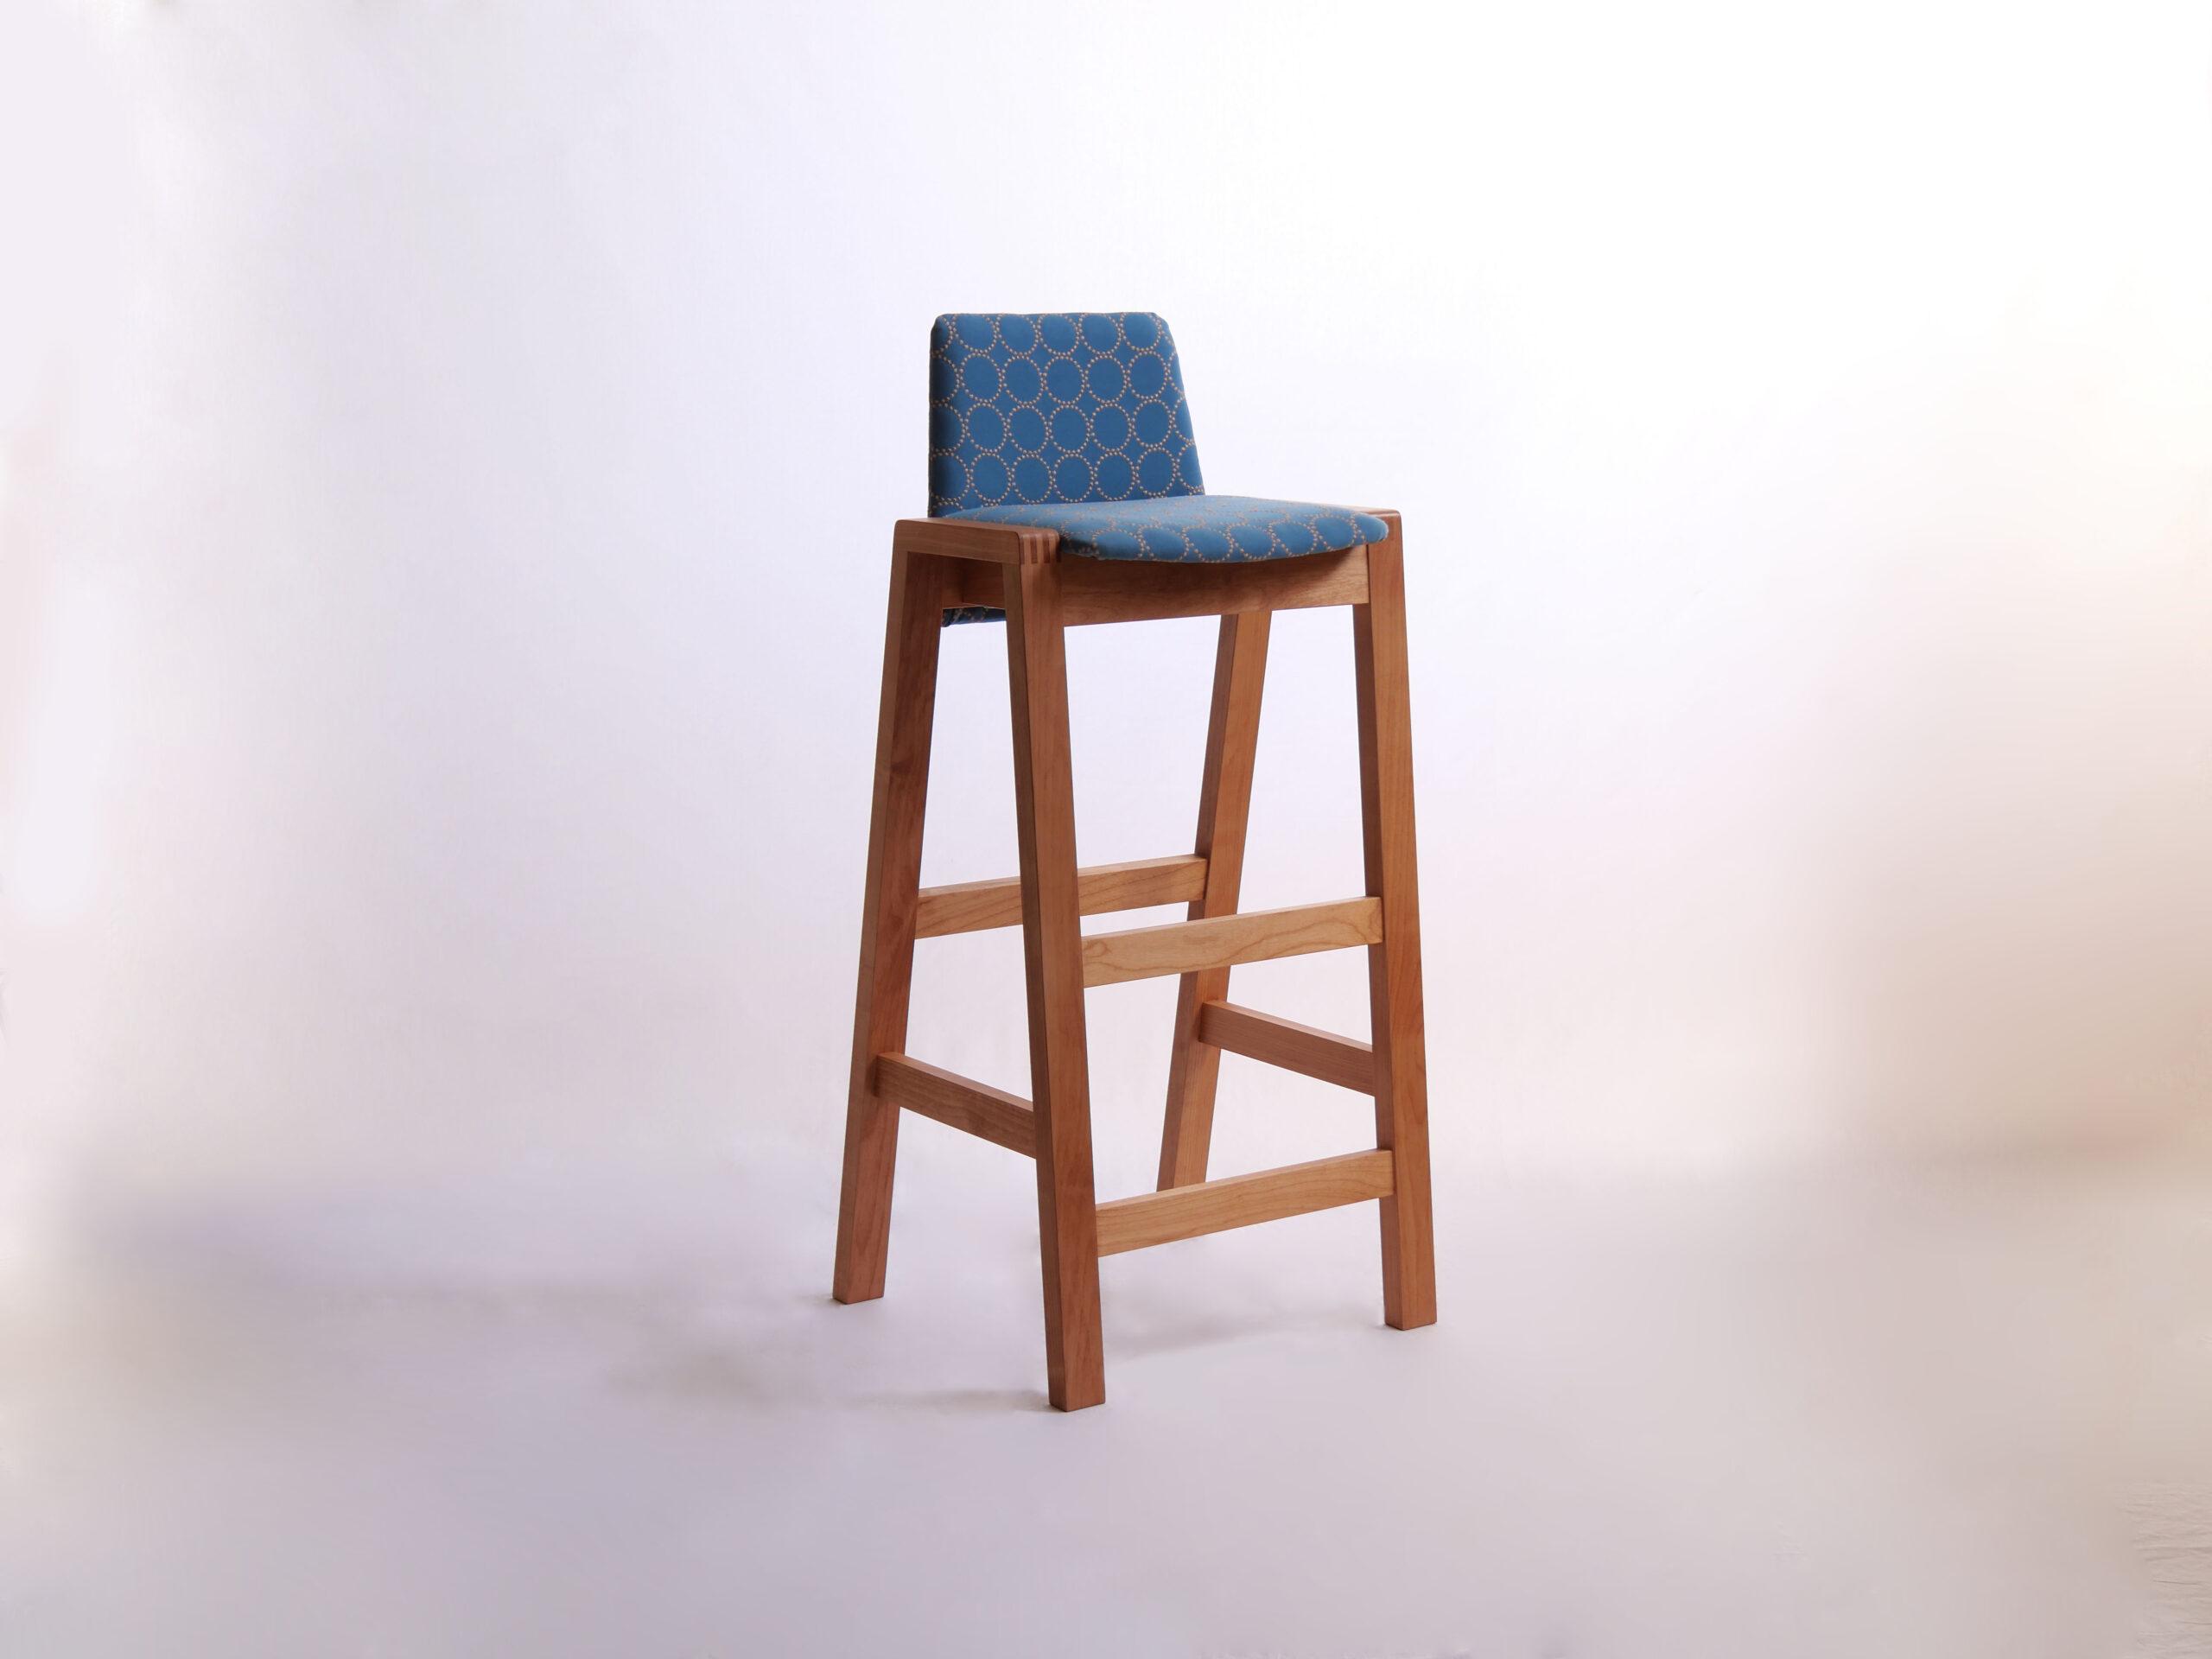 The highest stool